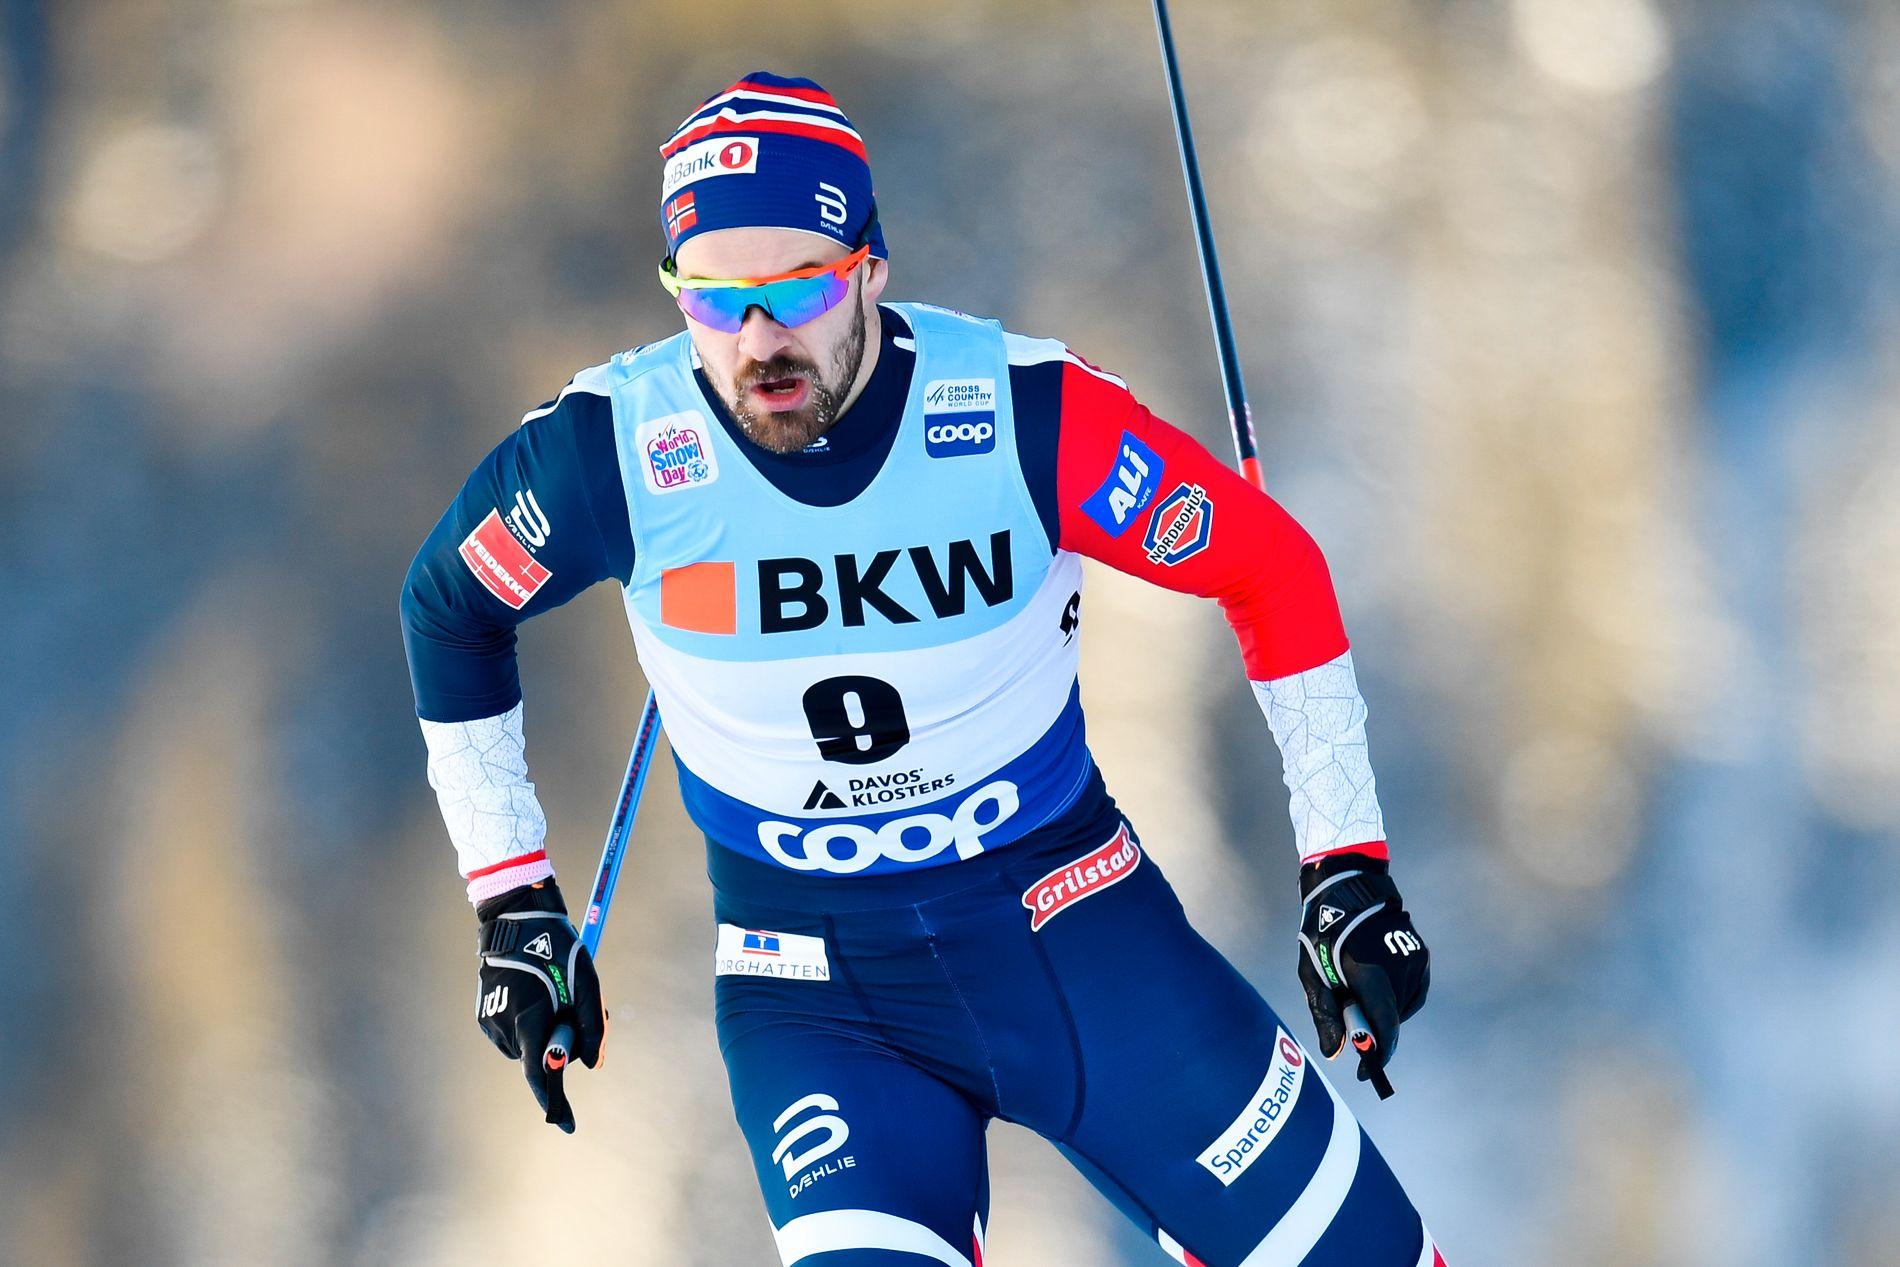 LANDSLAGSLØPER: Sondre Turvoll Fossli står med en verdenscupseier i sprint fra Ruka i Finland i 2015.